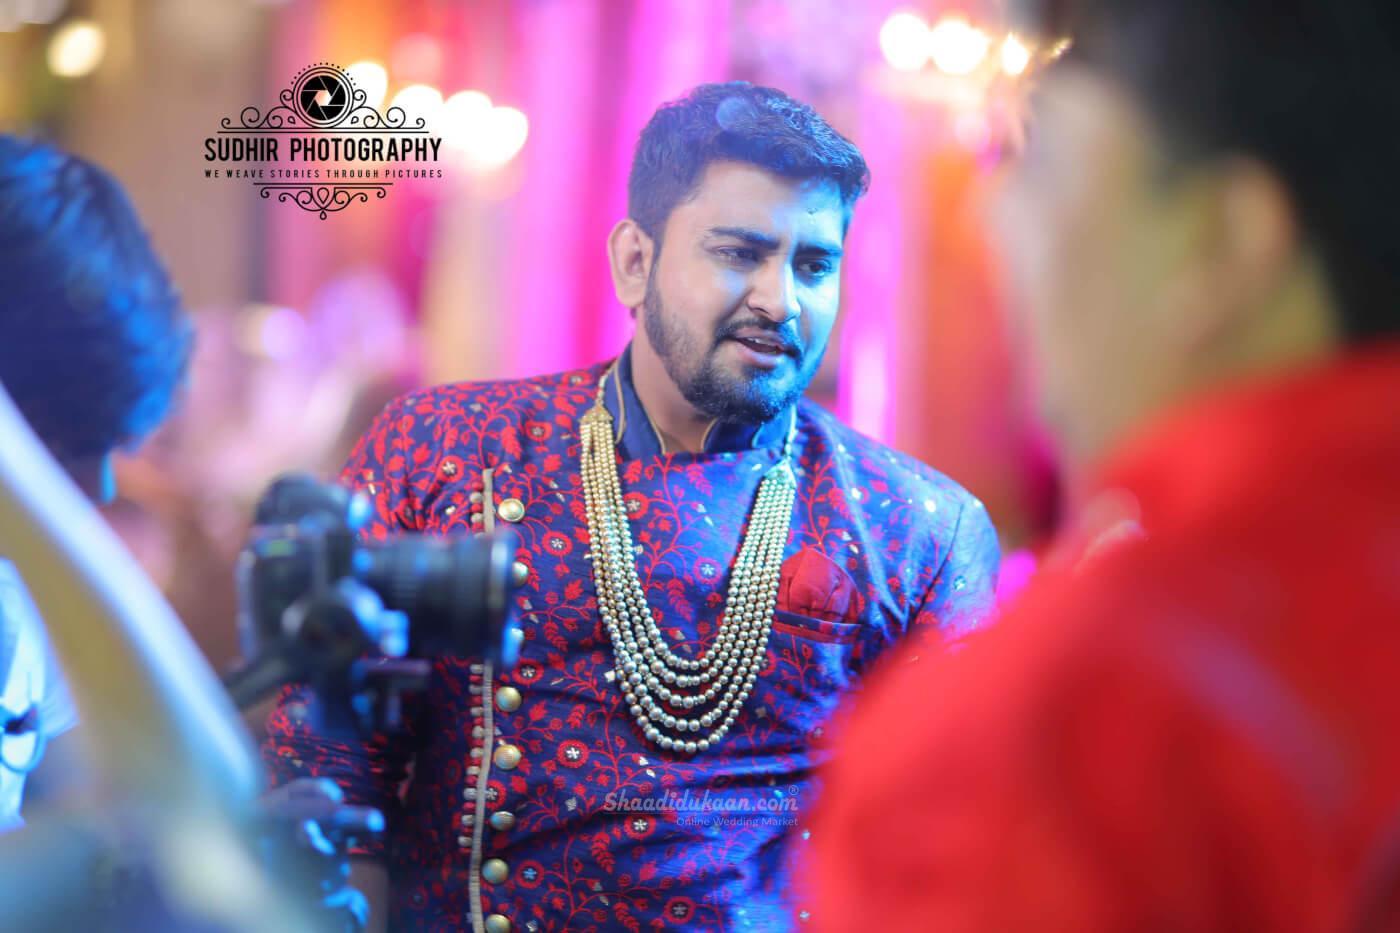 Sudhir Photography